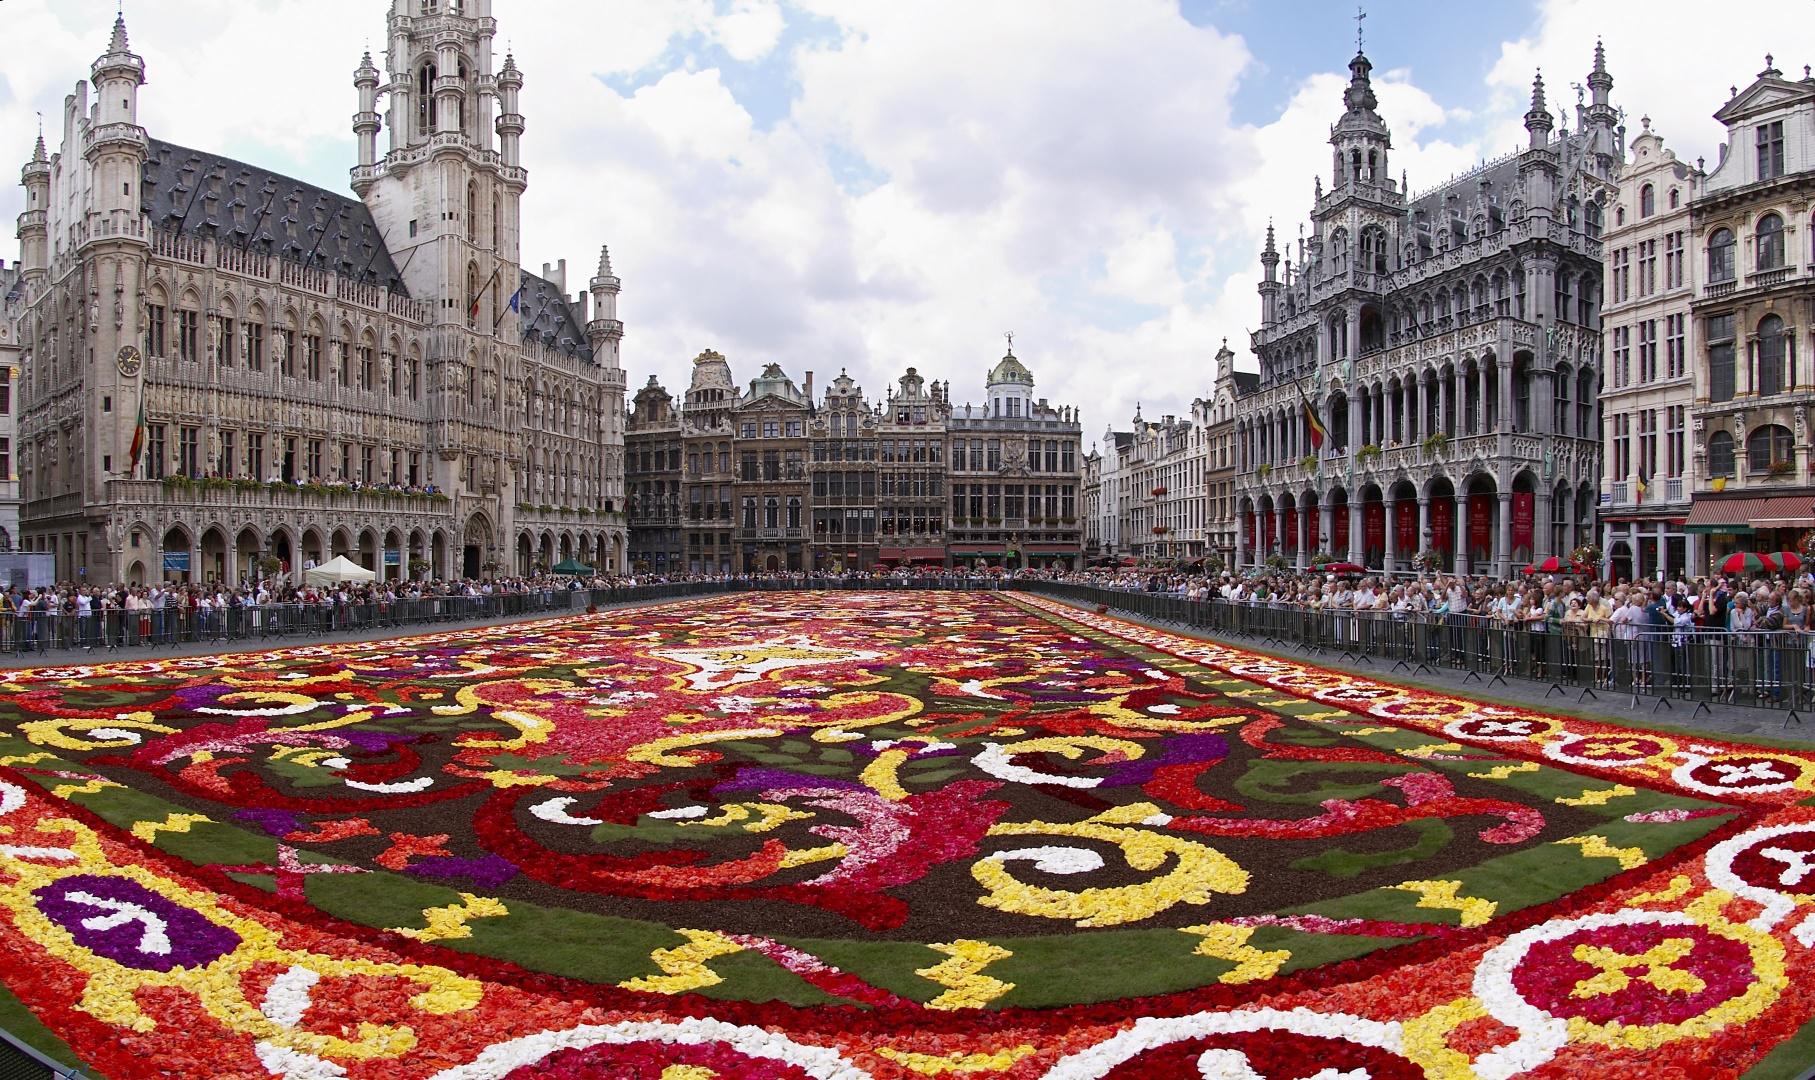 La grande place, Bruselas